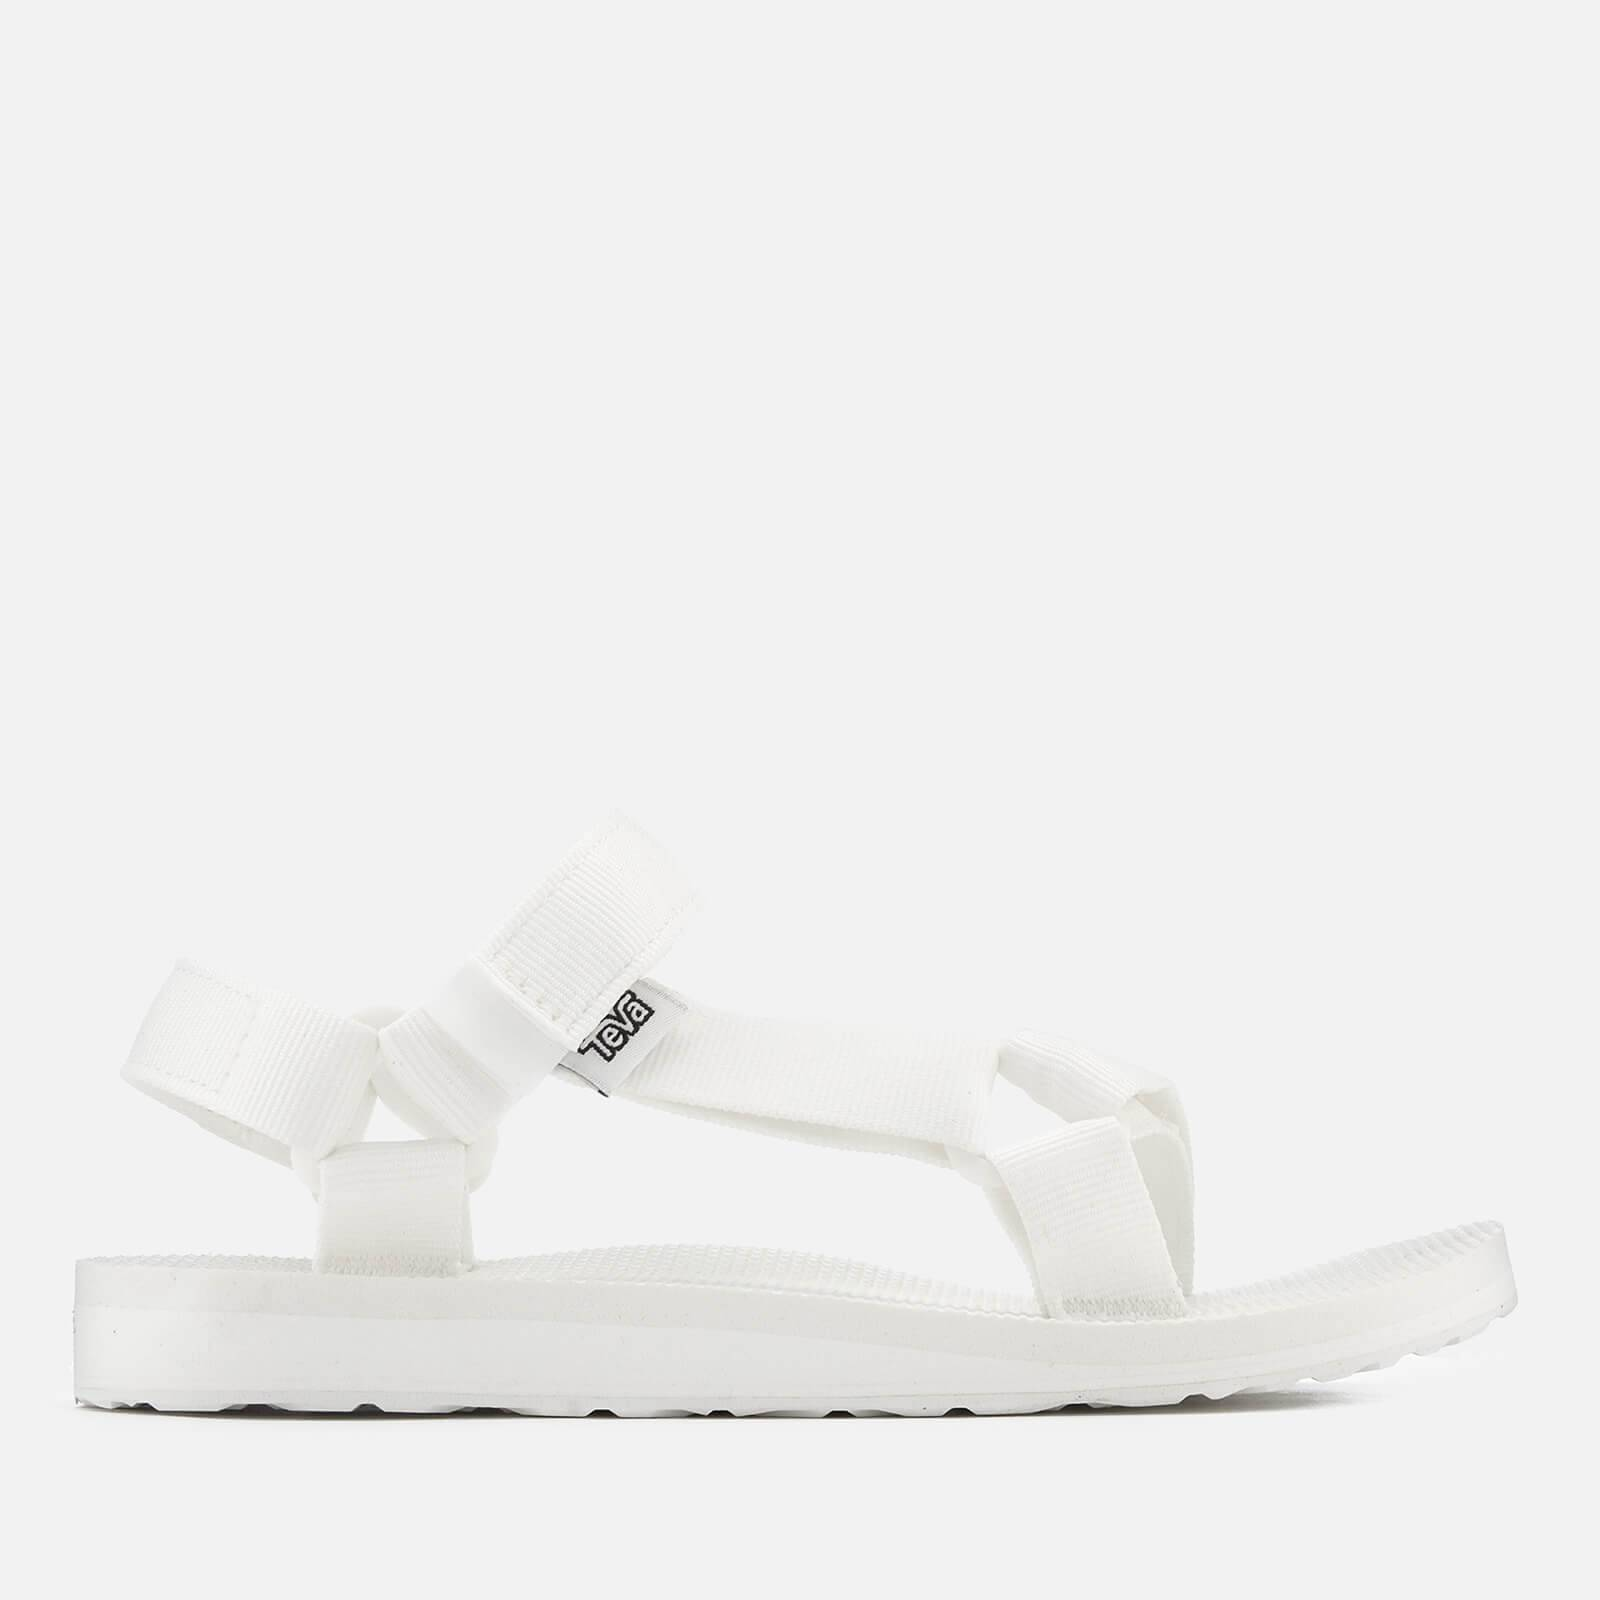 Teva Women's Original Universal Sport Sandals - Bright White - UK 4